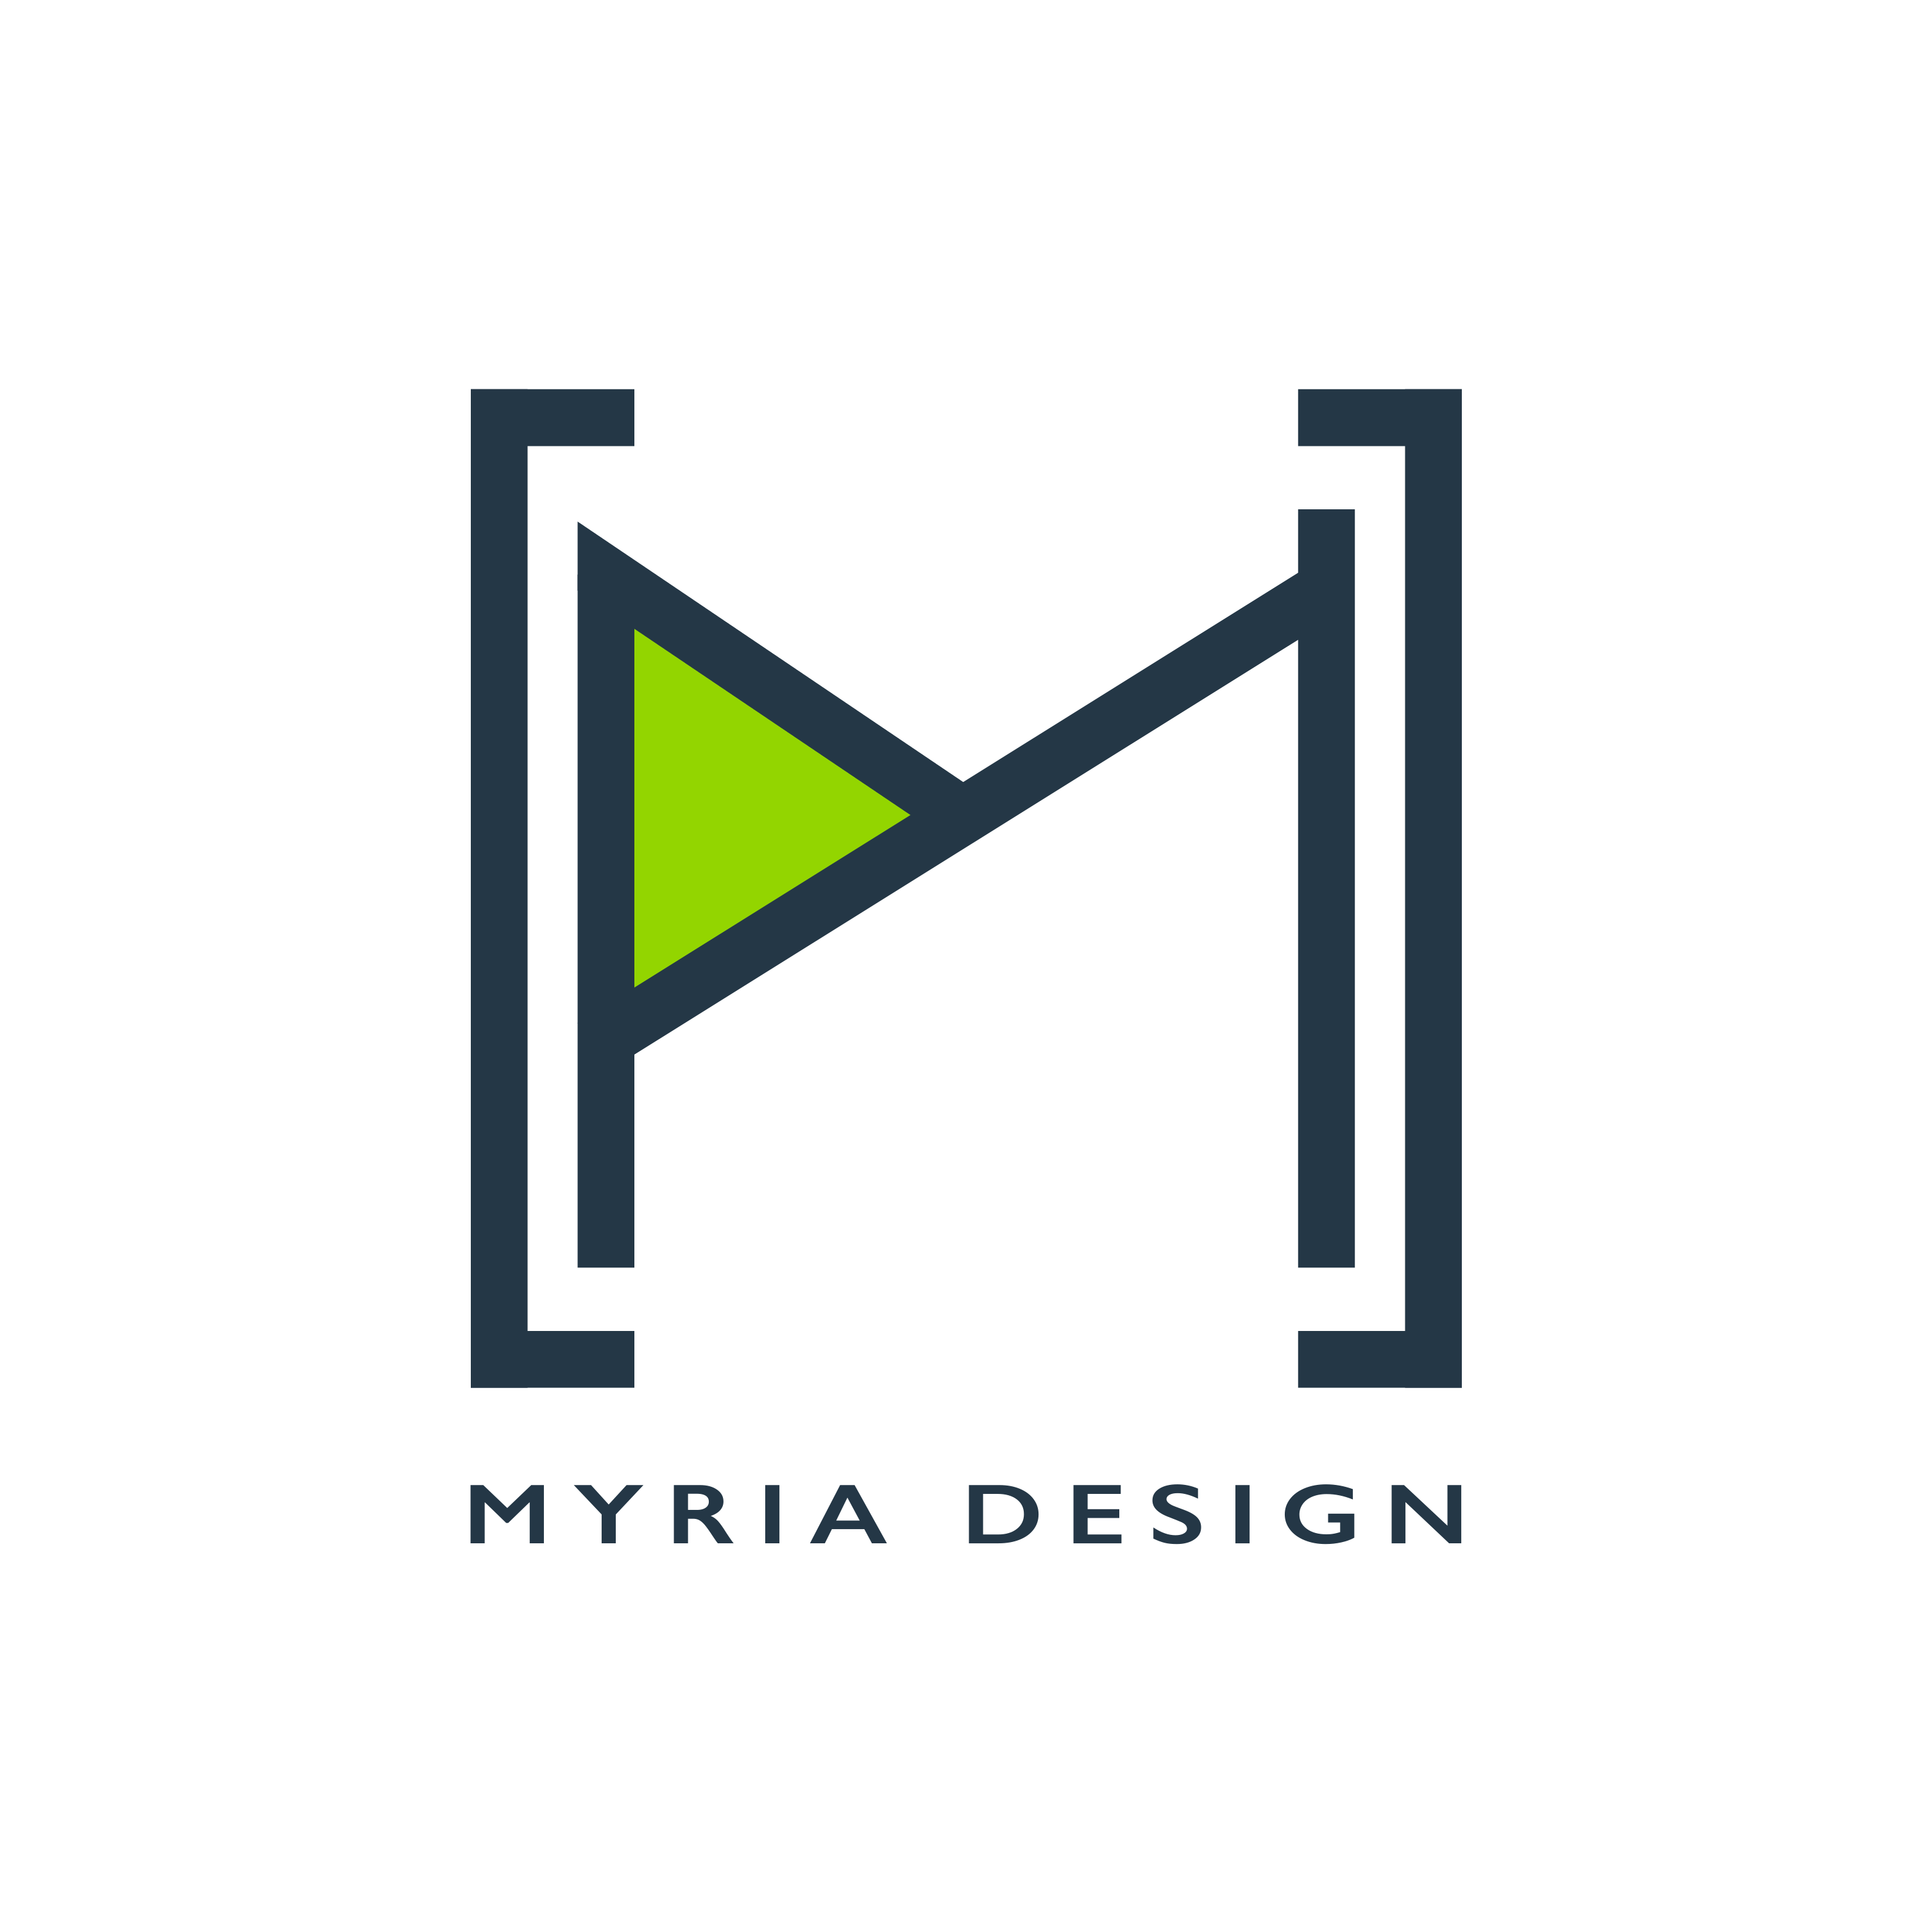 myria design logo square